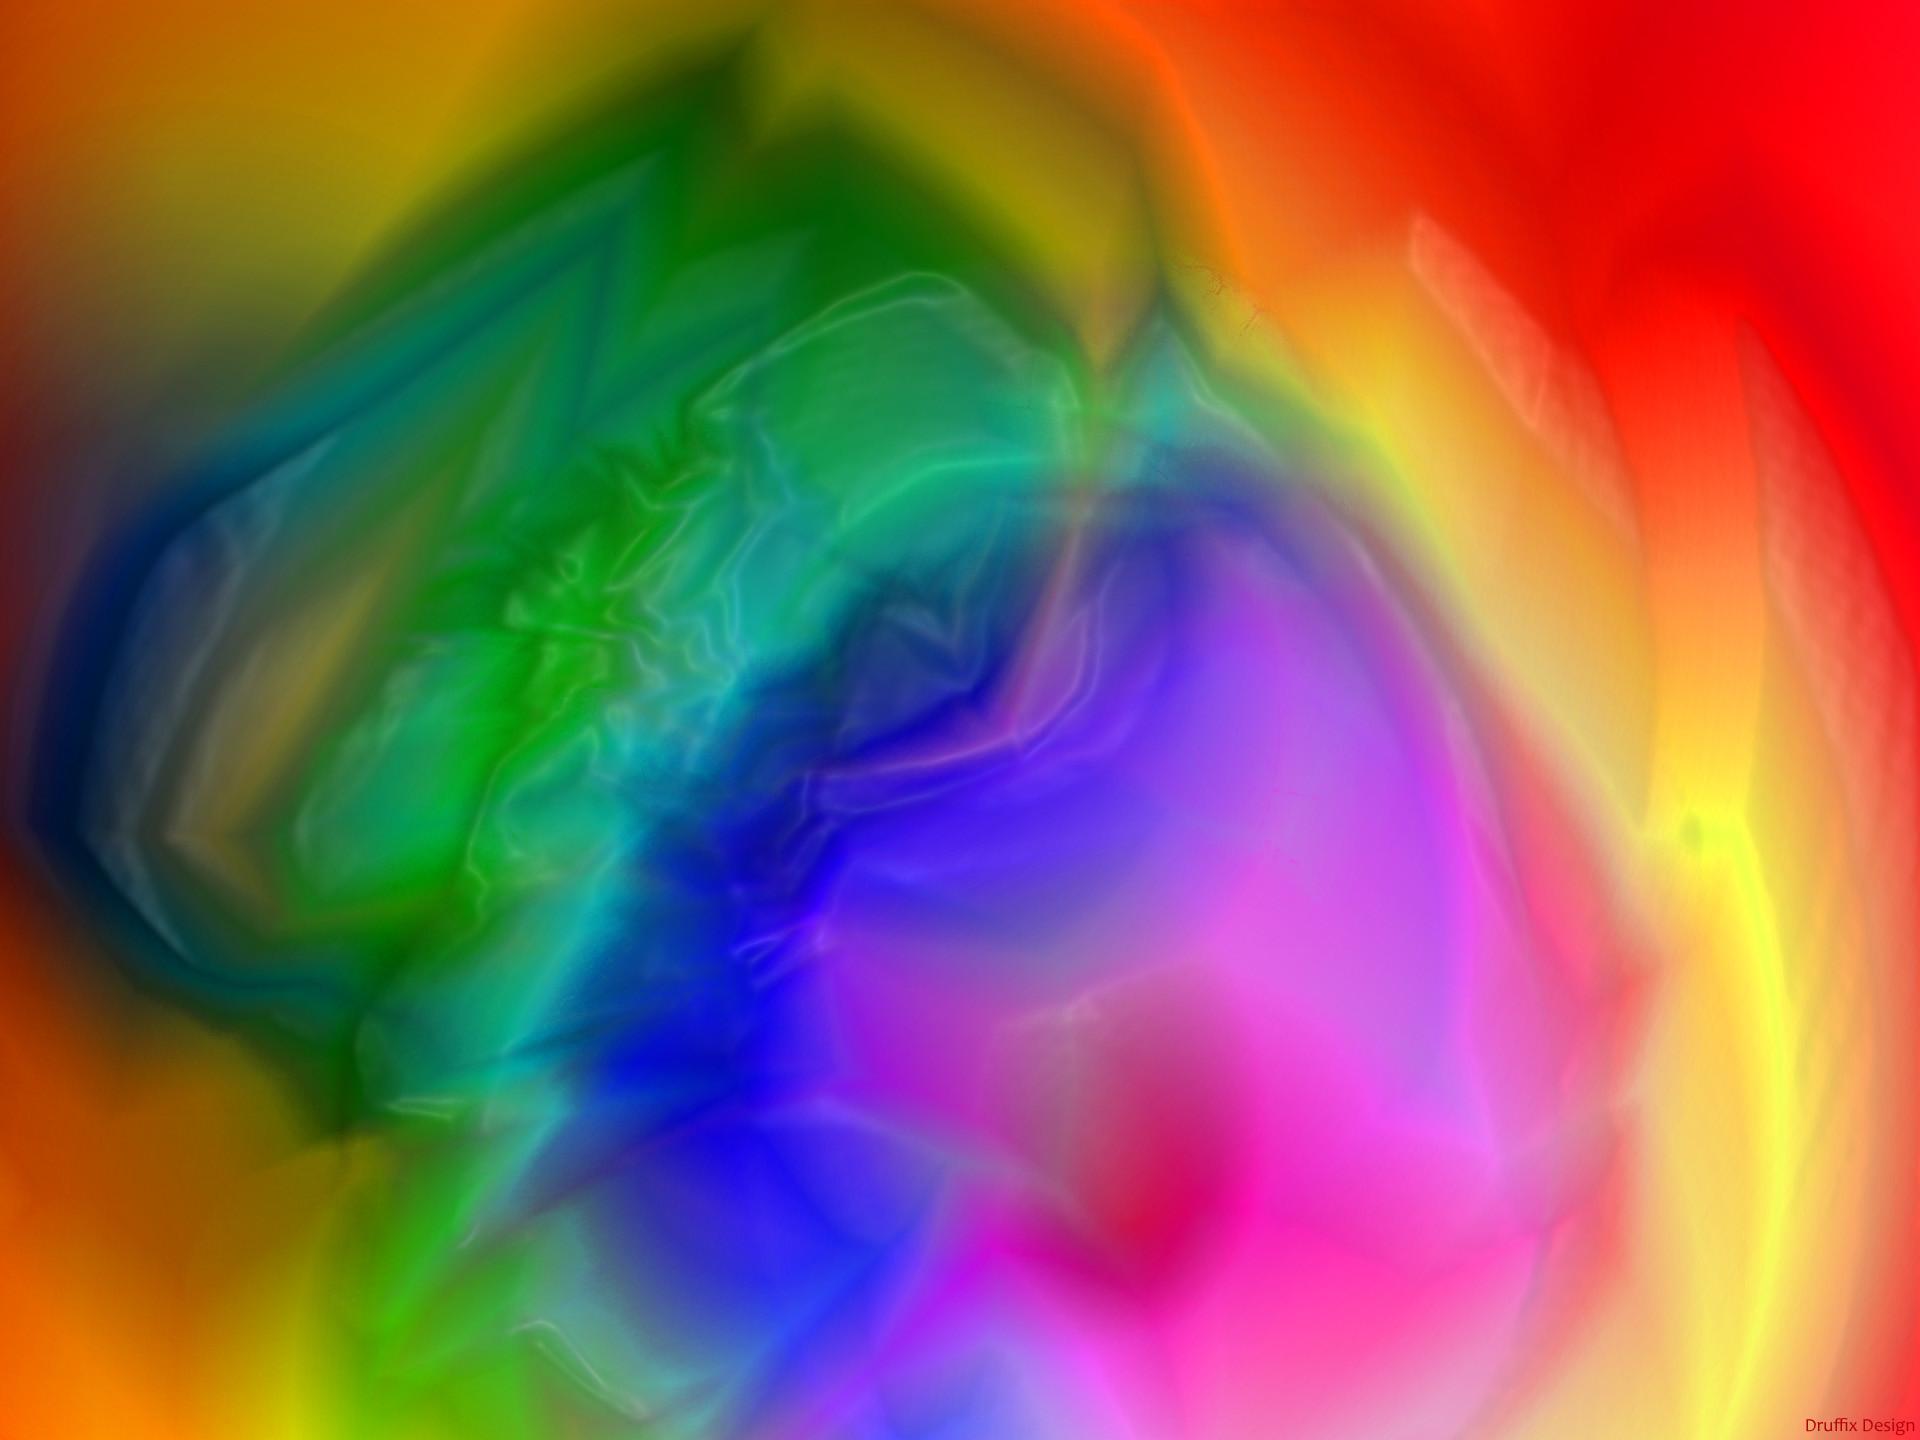 Trippy Wallpaper Iphone X Rainbow Zebra Background Designs 183 ①